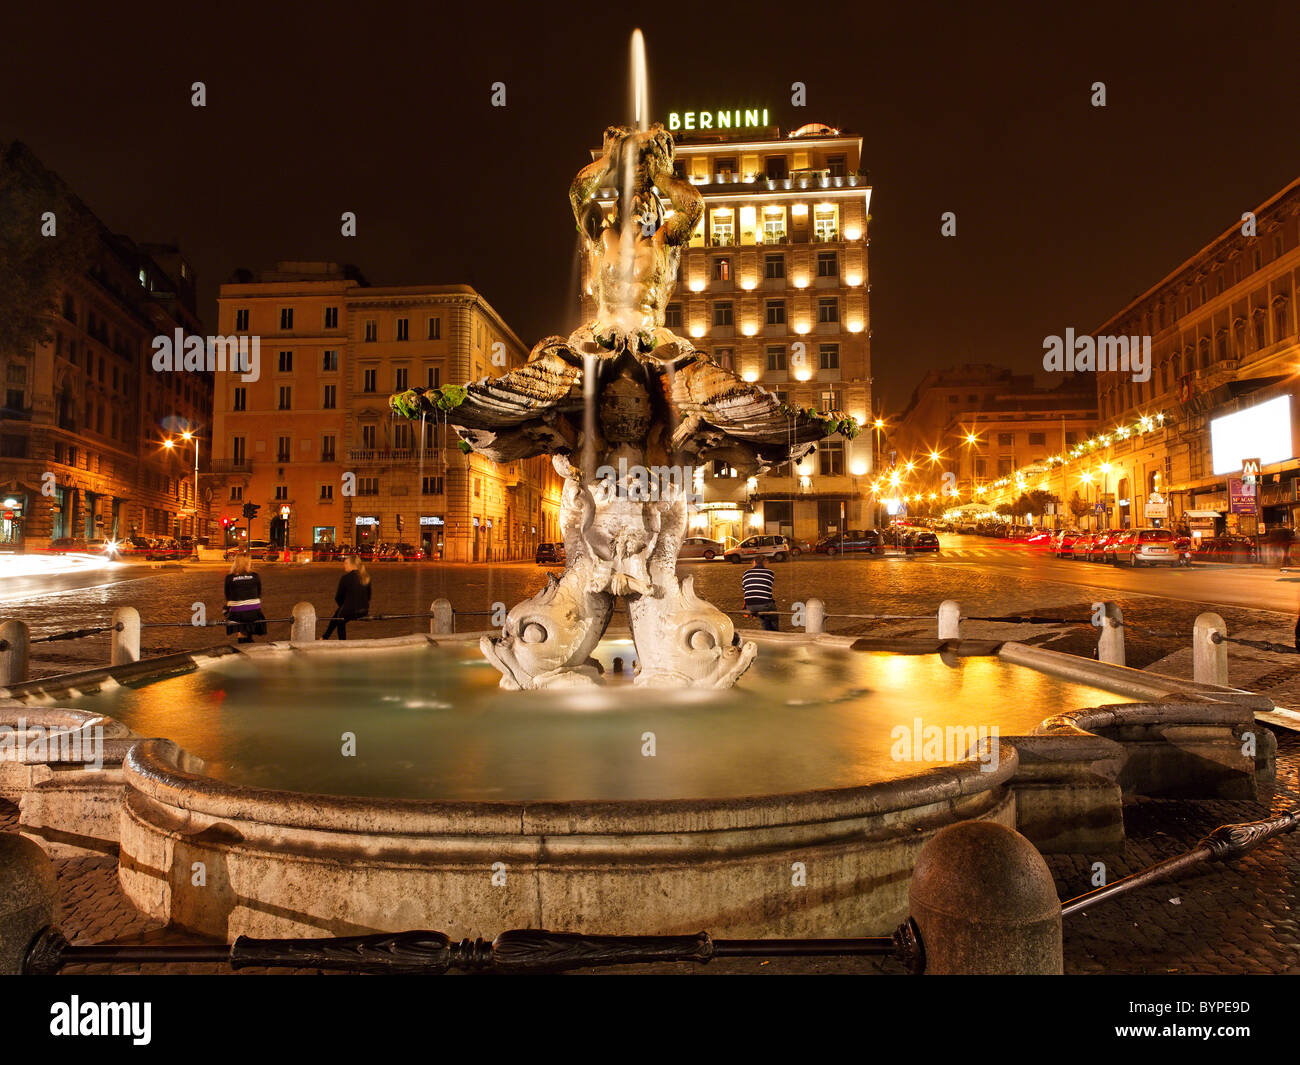 The Triton Fountain at Night, Piazza Bernini, Rome, Italy - Stock Image